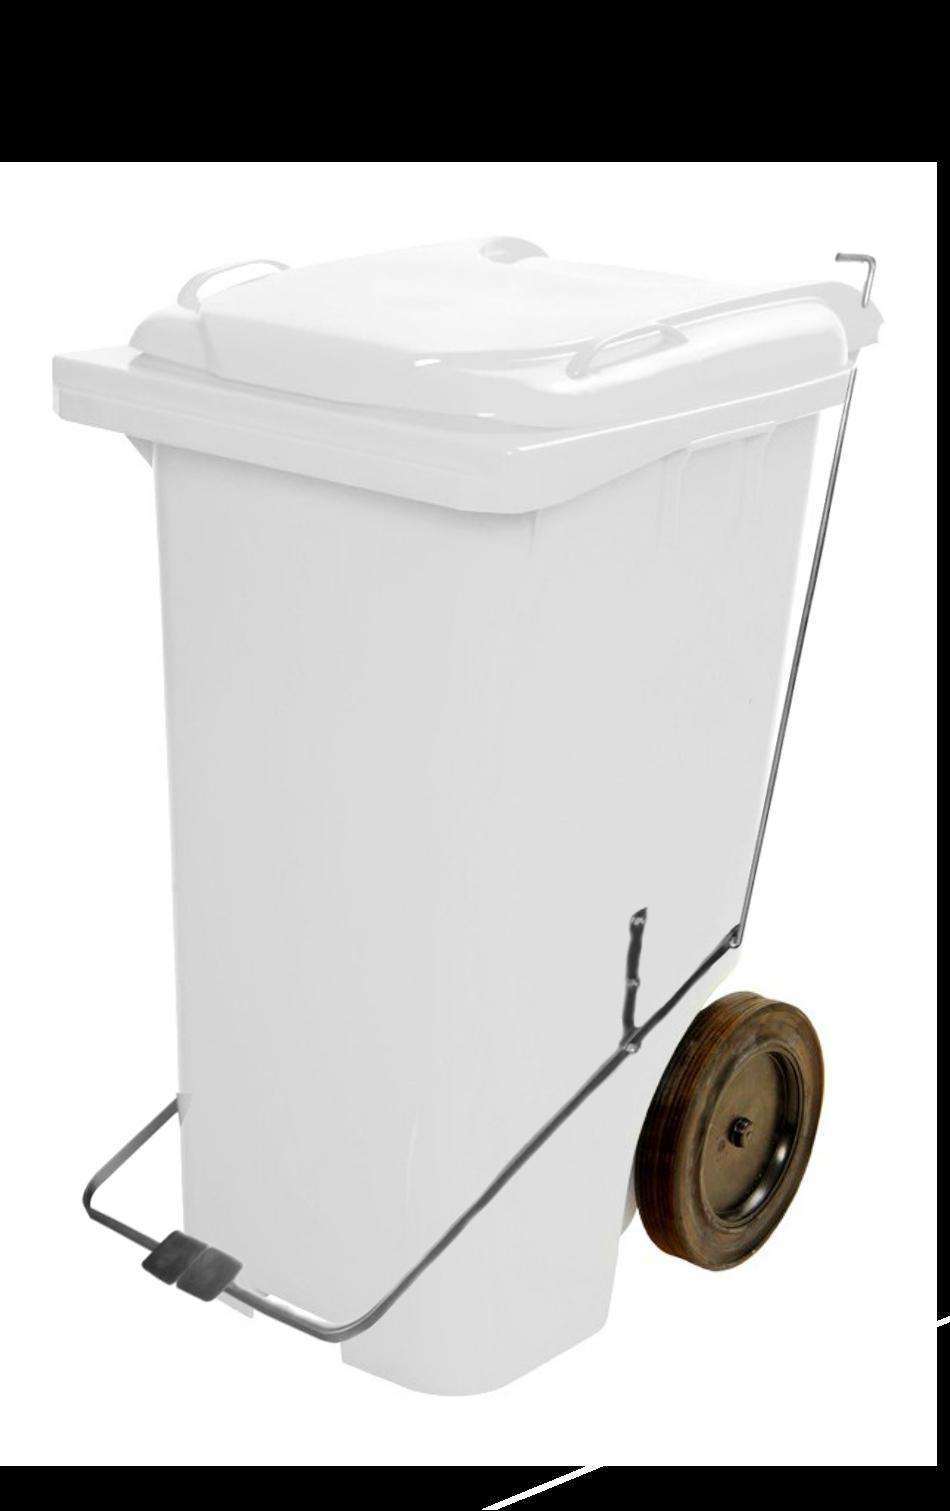 Lixeira Gari com Pedal JSN Colorida - 120 / 240 litros